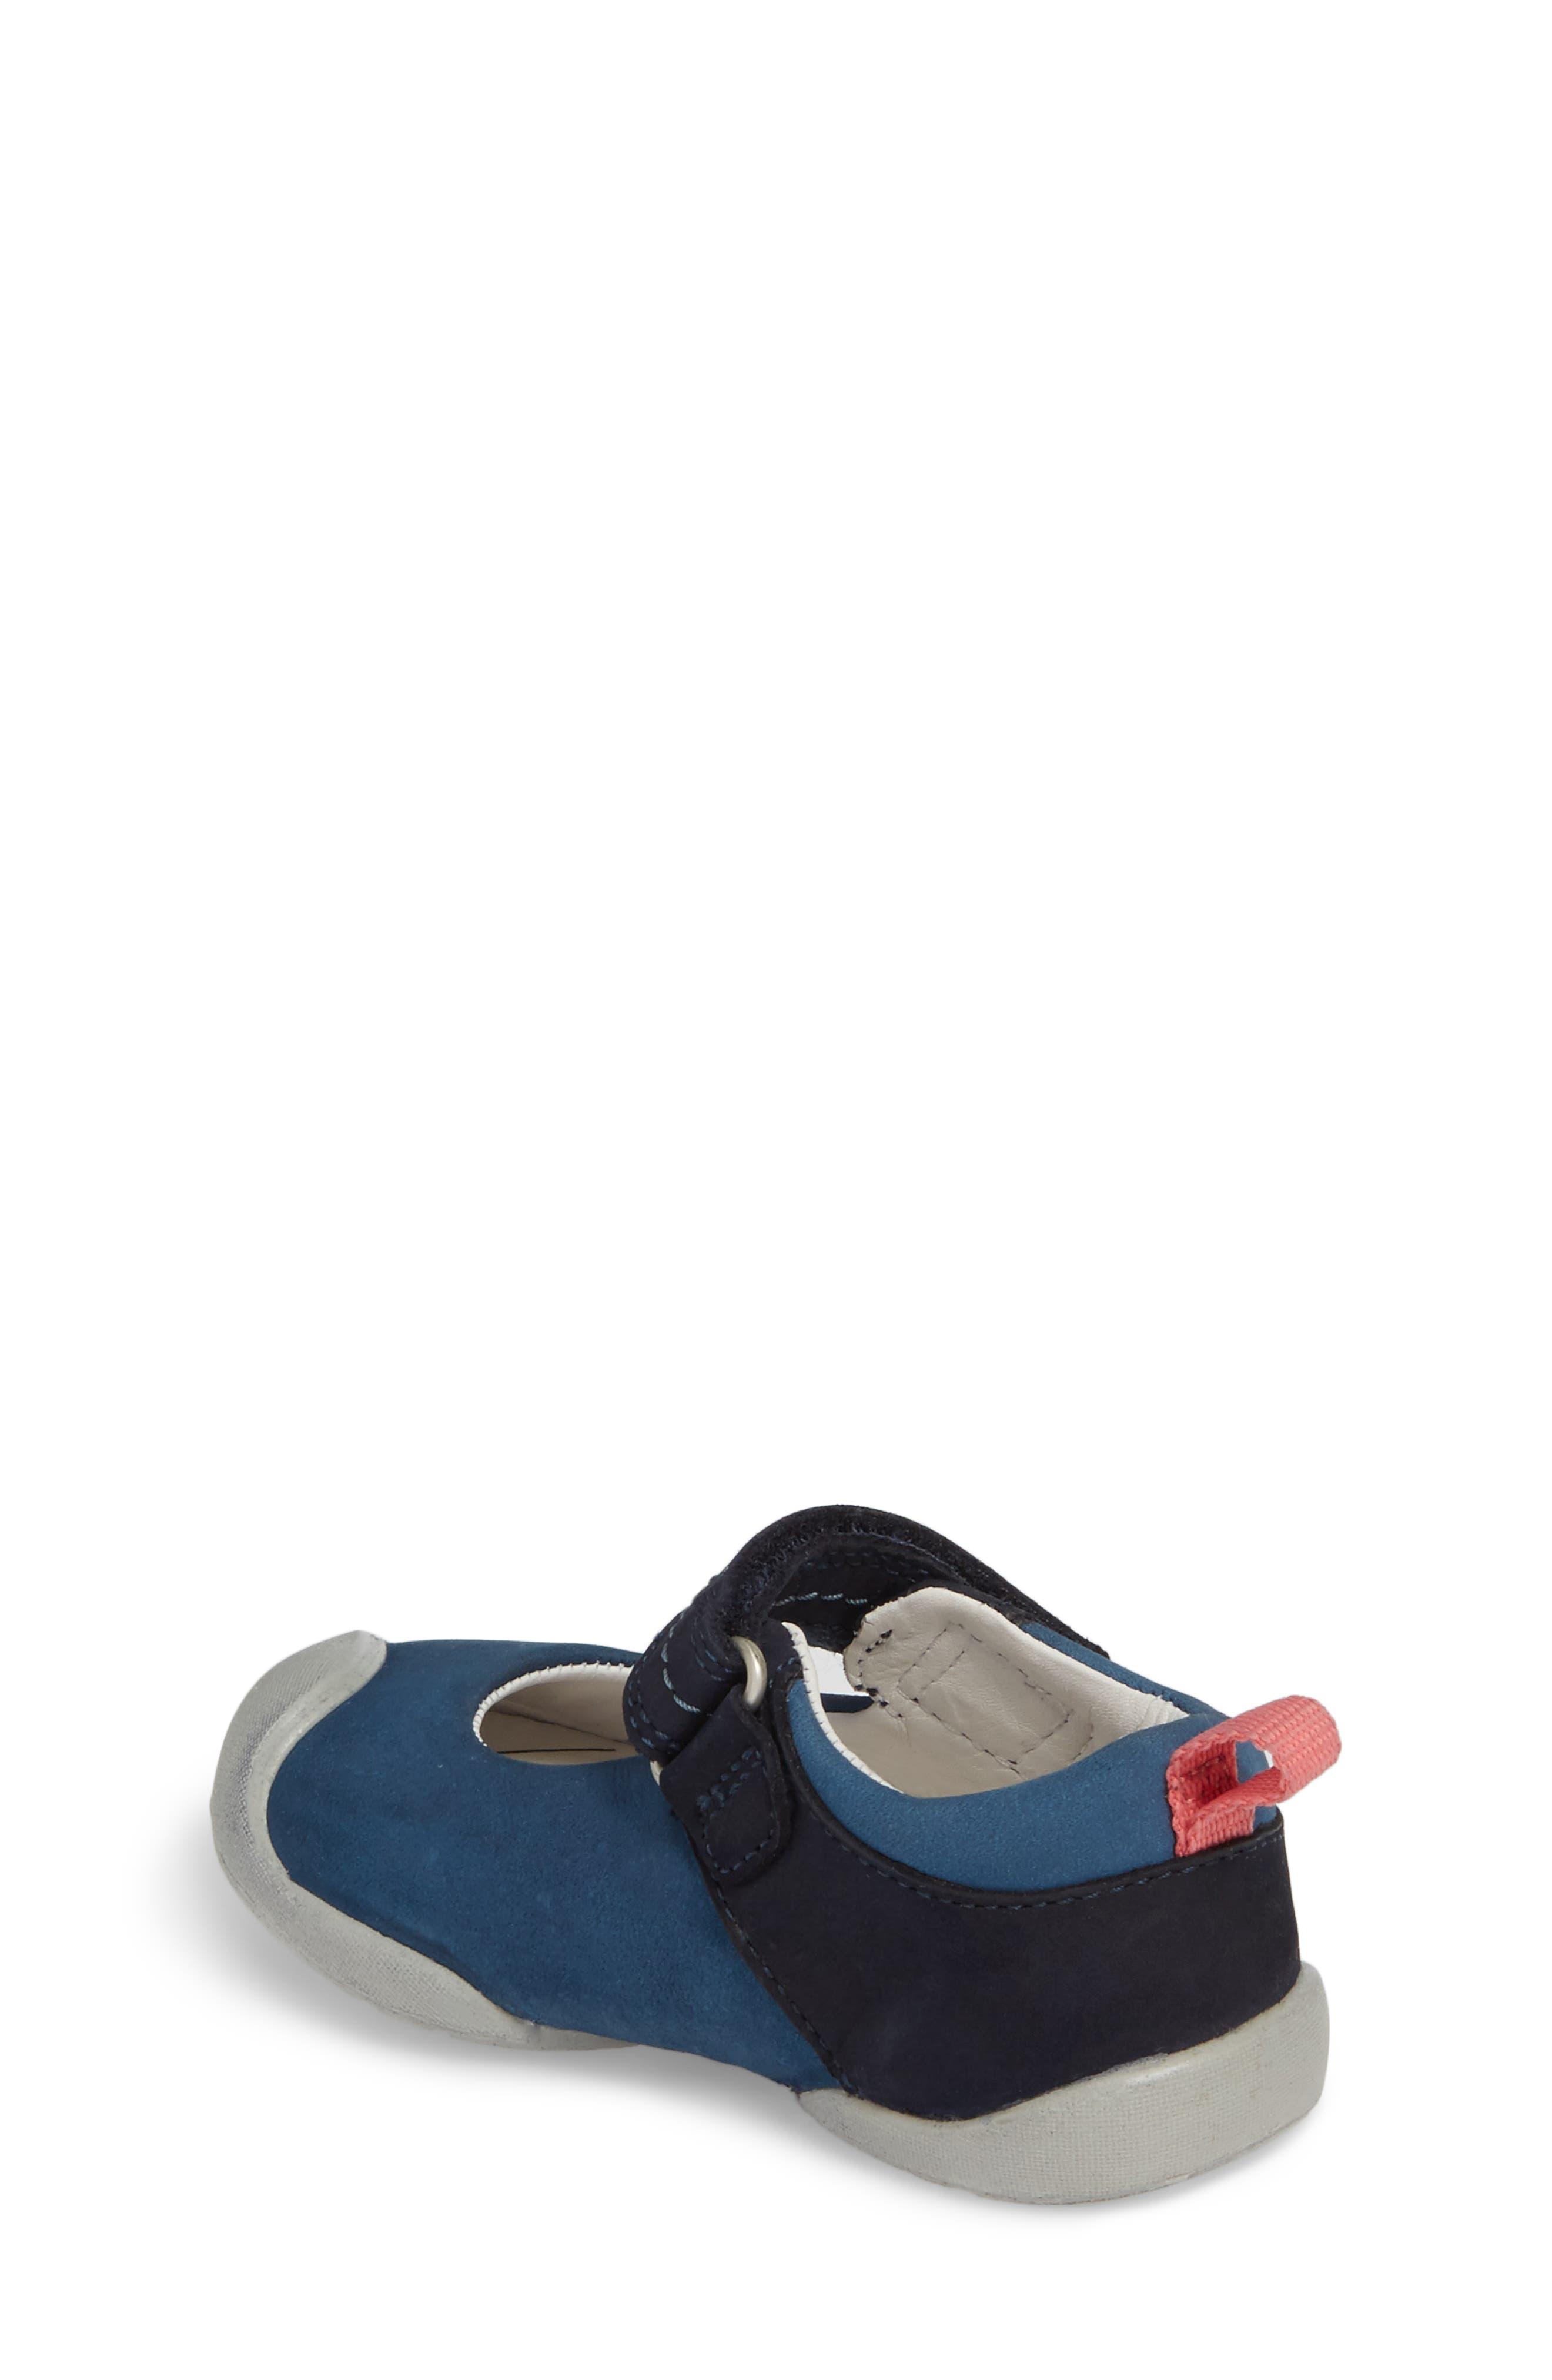 Pep Mary Jane-T Sneaker,                             Alternate thumbnail 2, color,                             Dress Blues/ Sugar Coral